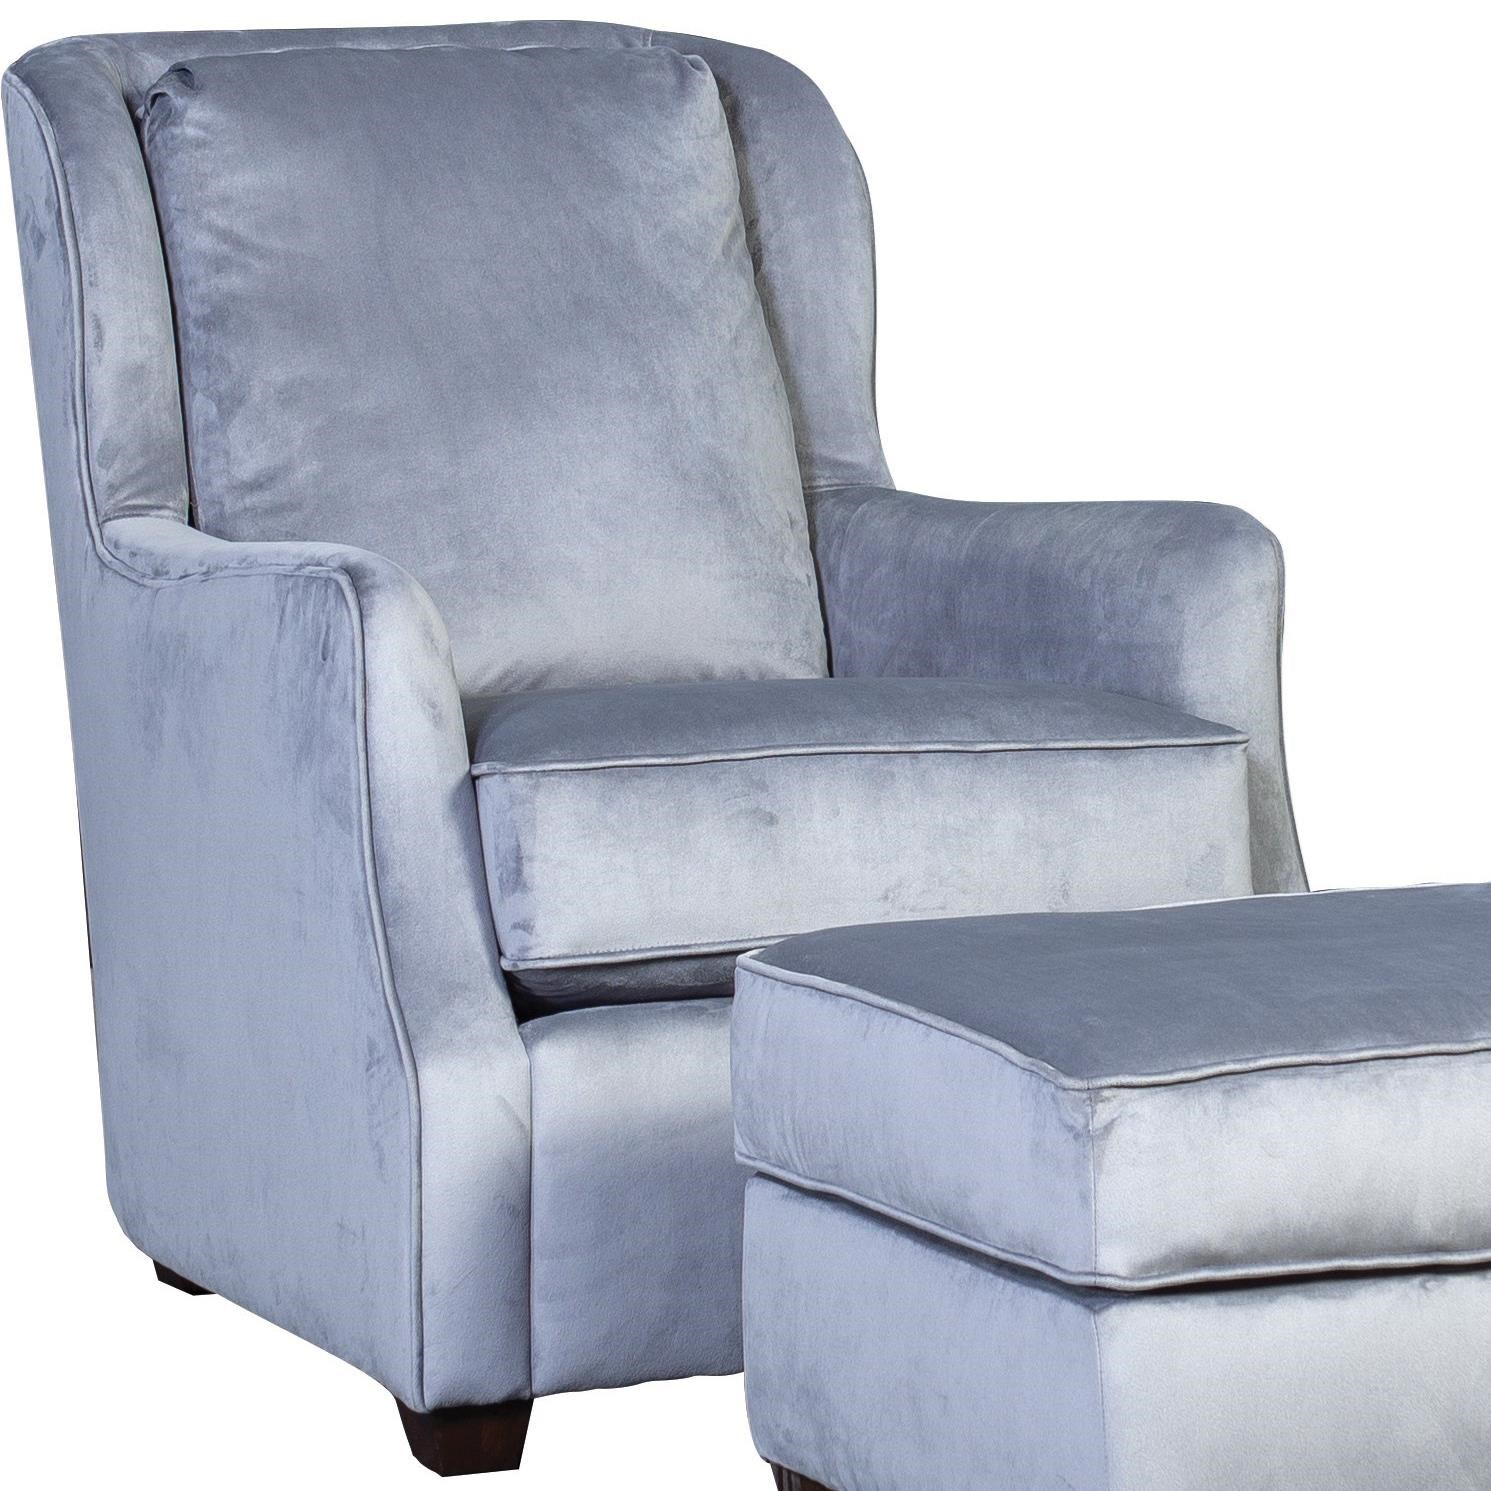 5656 Chair by Mayo at Pedigo Furniture